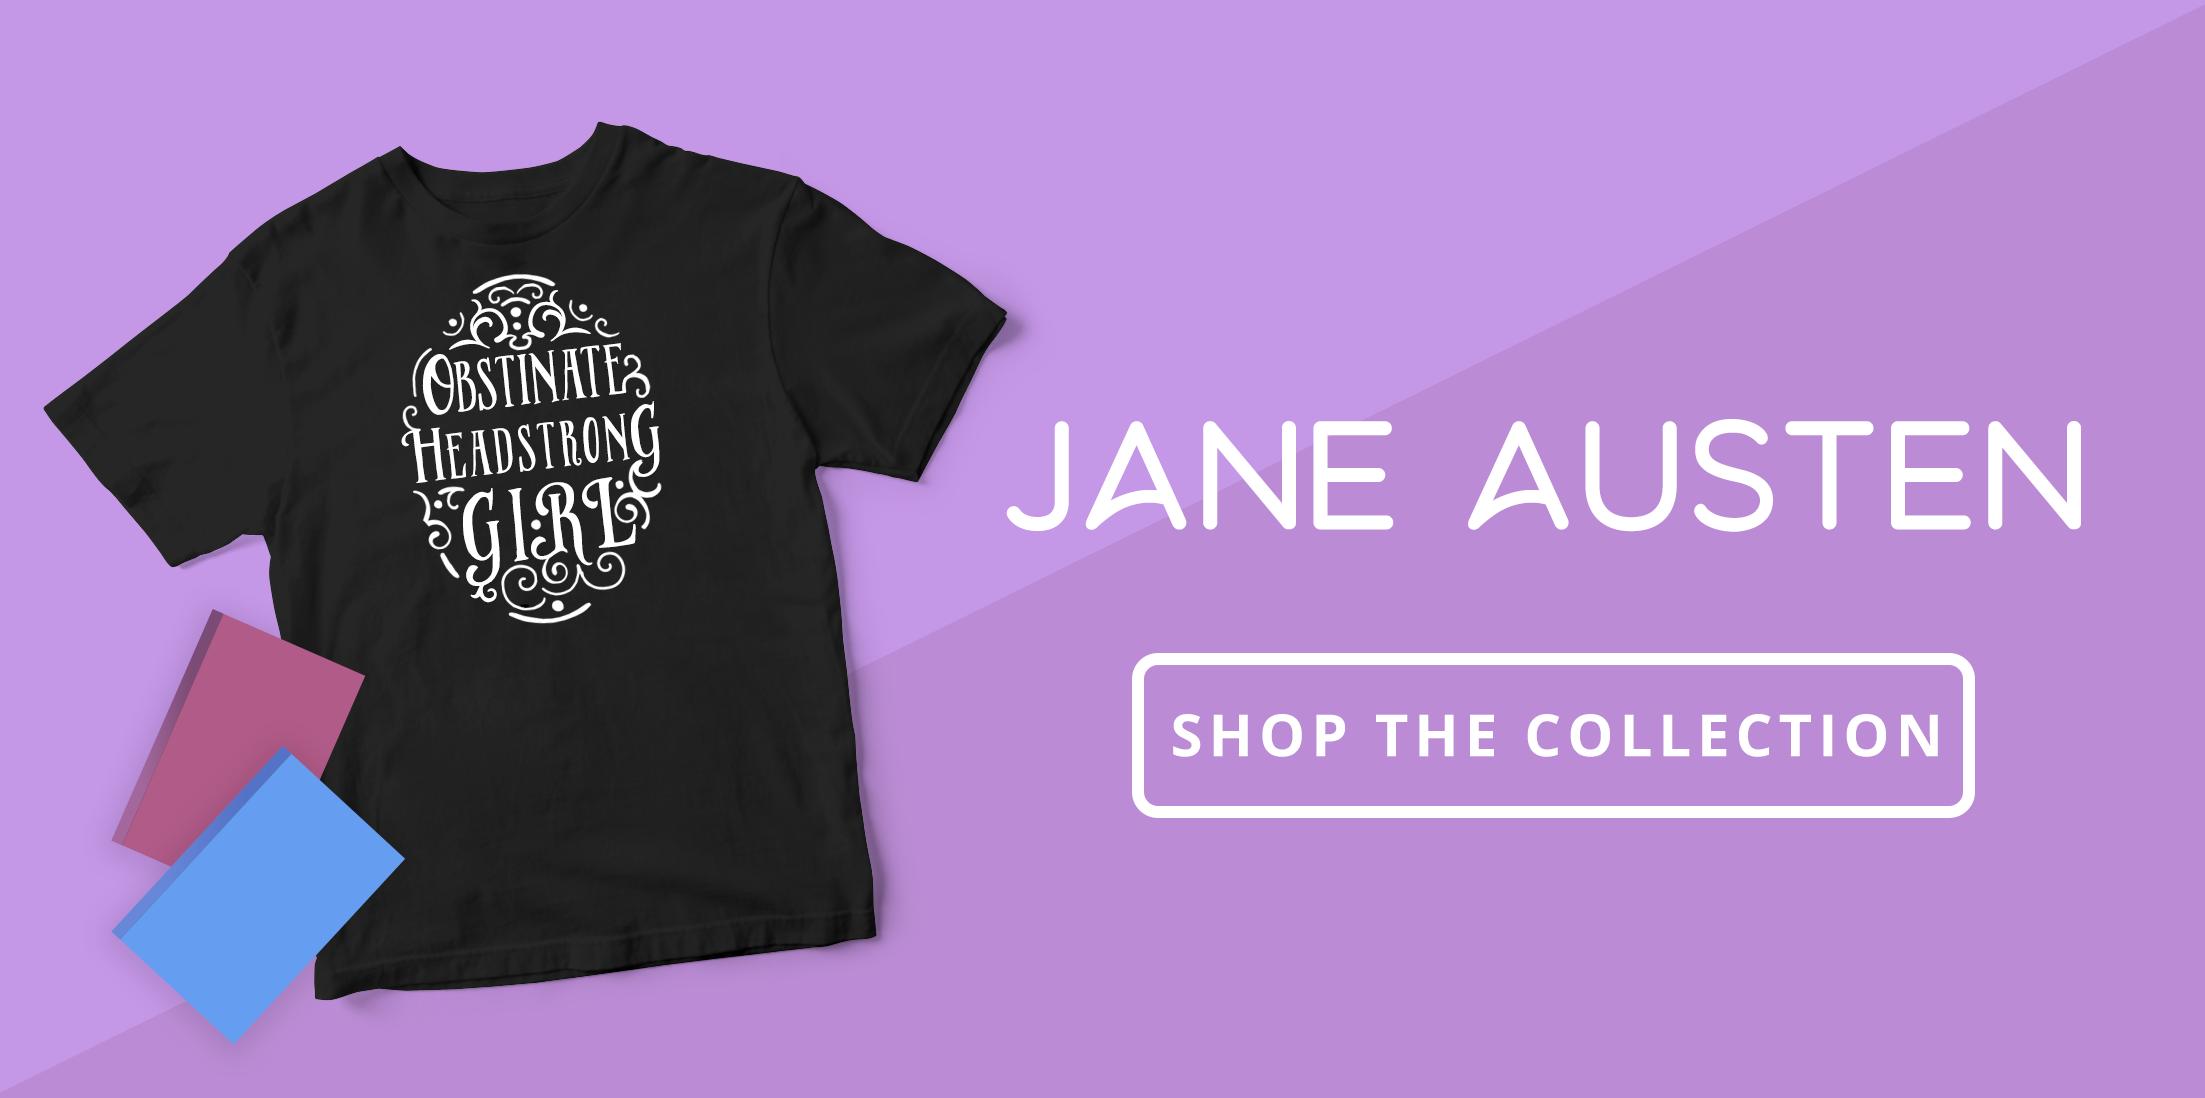 Shop the Collection: Jane Austen